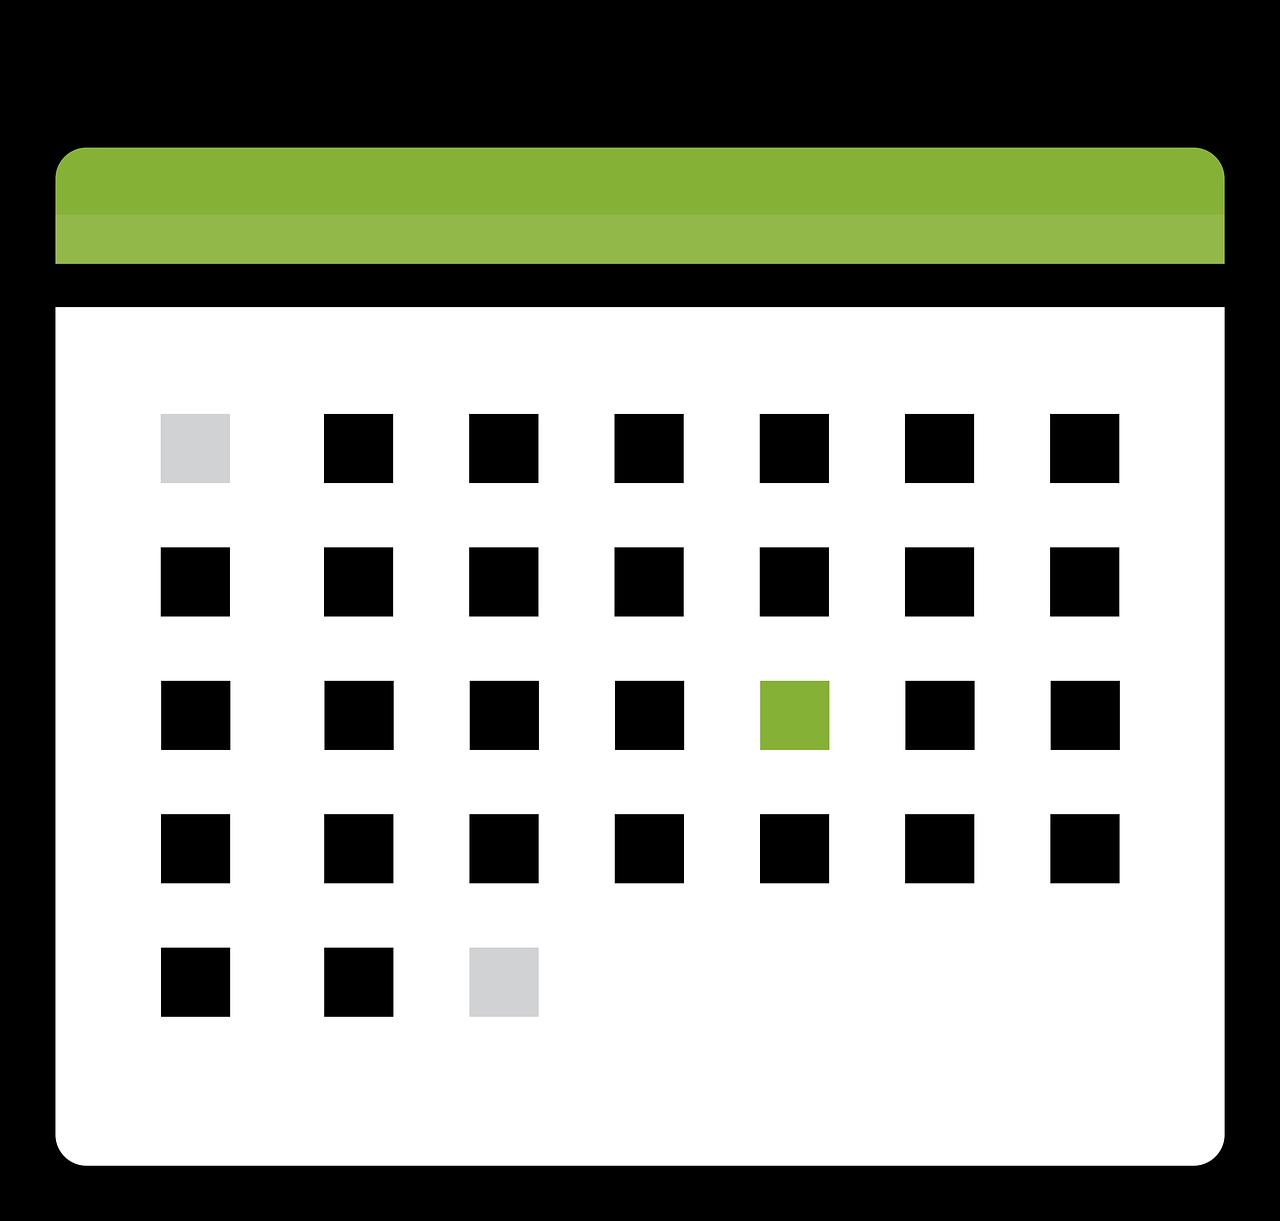 icon-1549619_1280